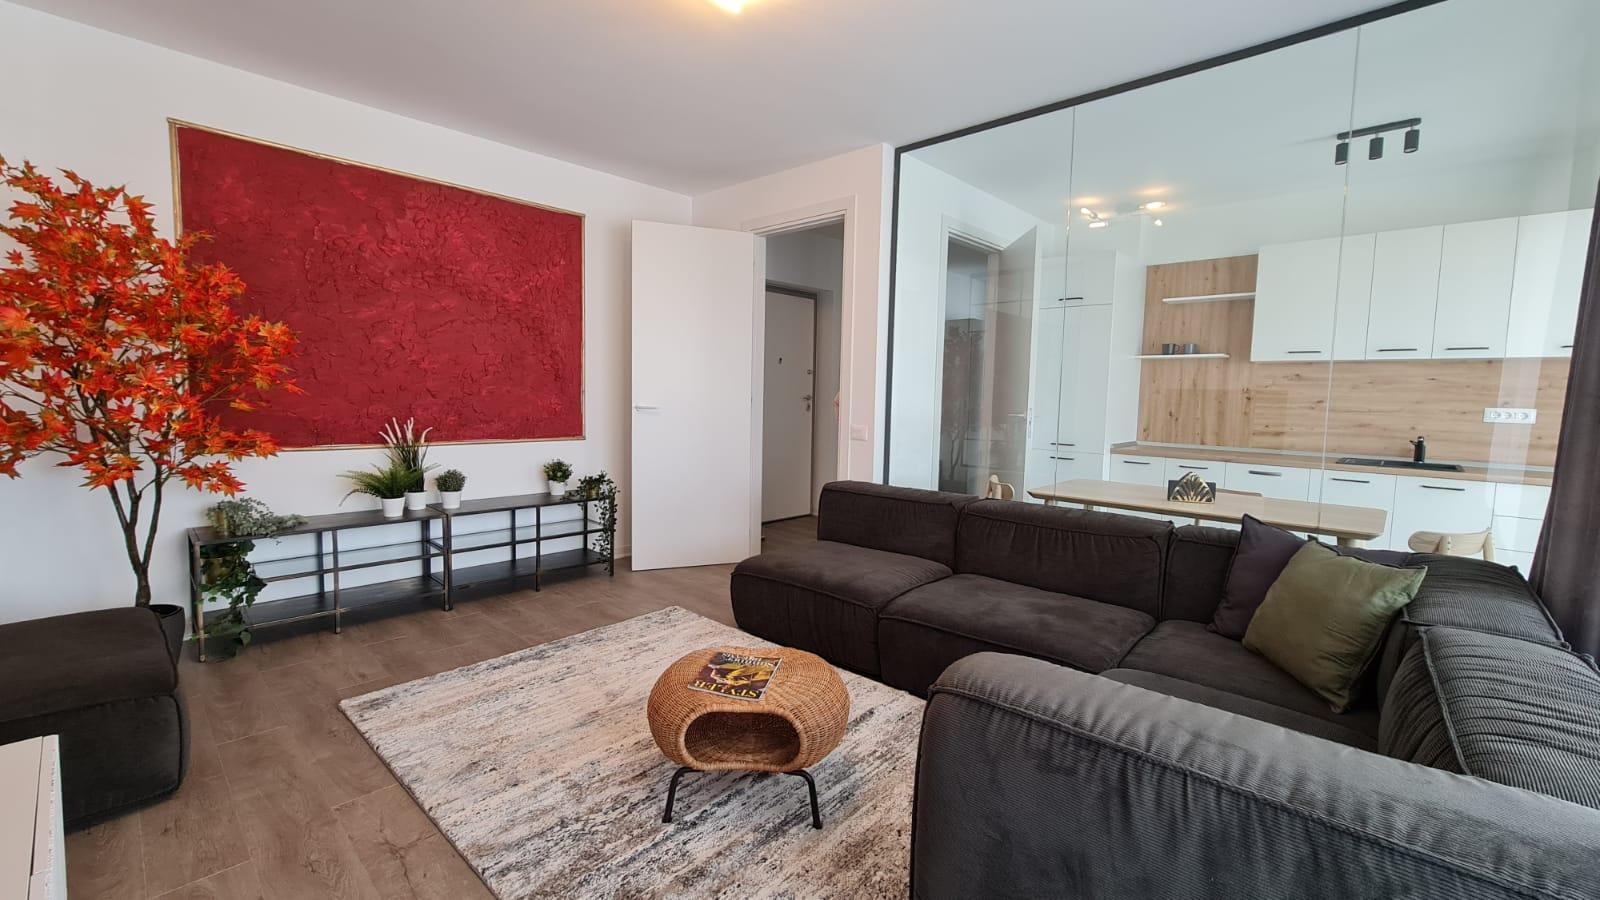 Apartament   2 camere   Aviatiei   Cloud 9 - DIRECT PROPRIETAR